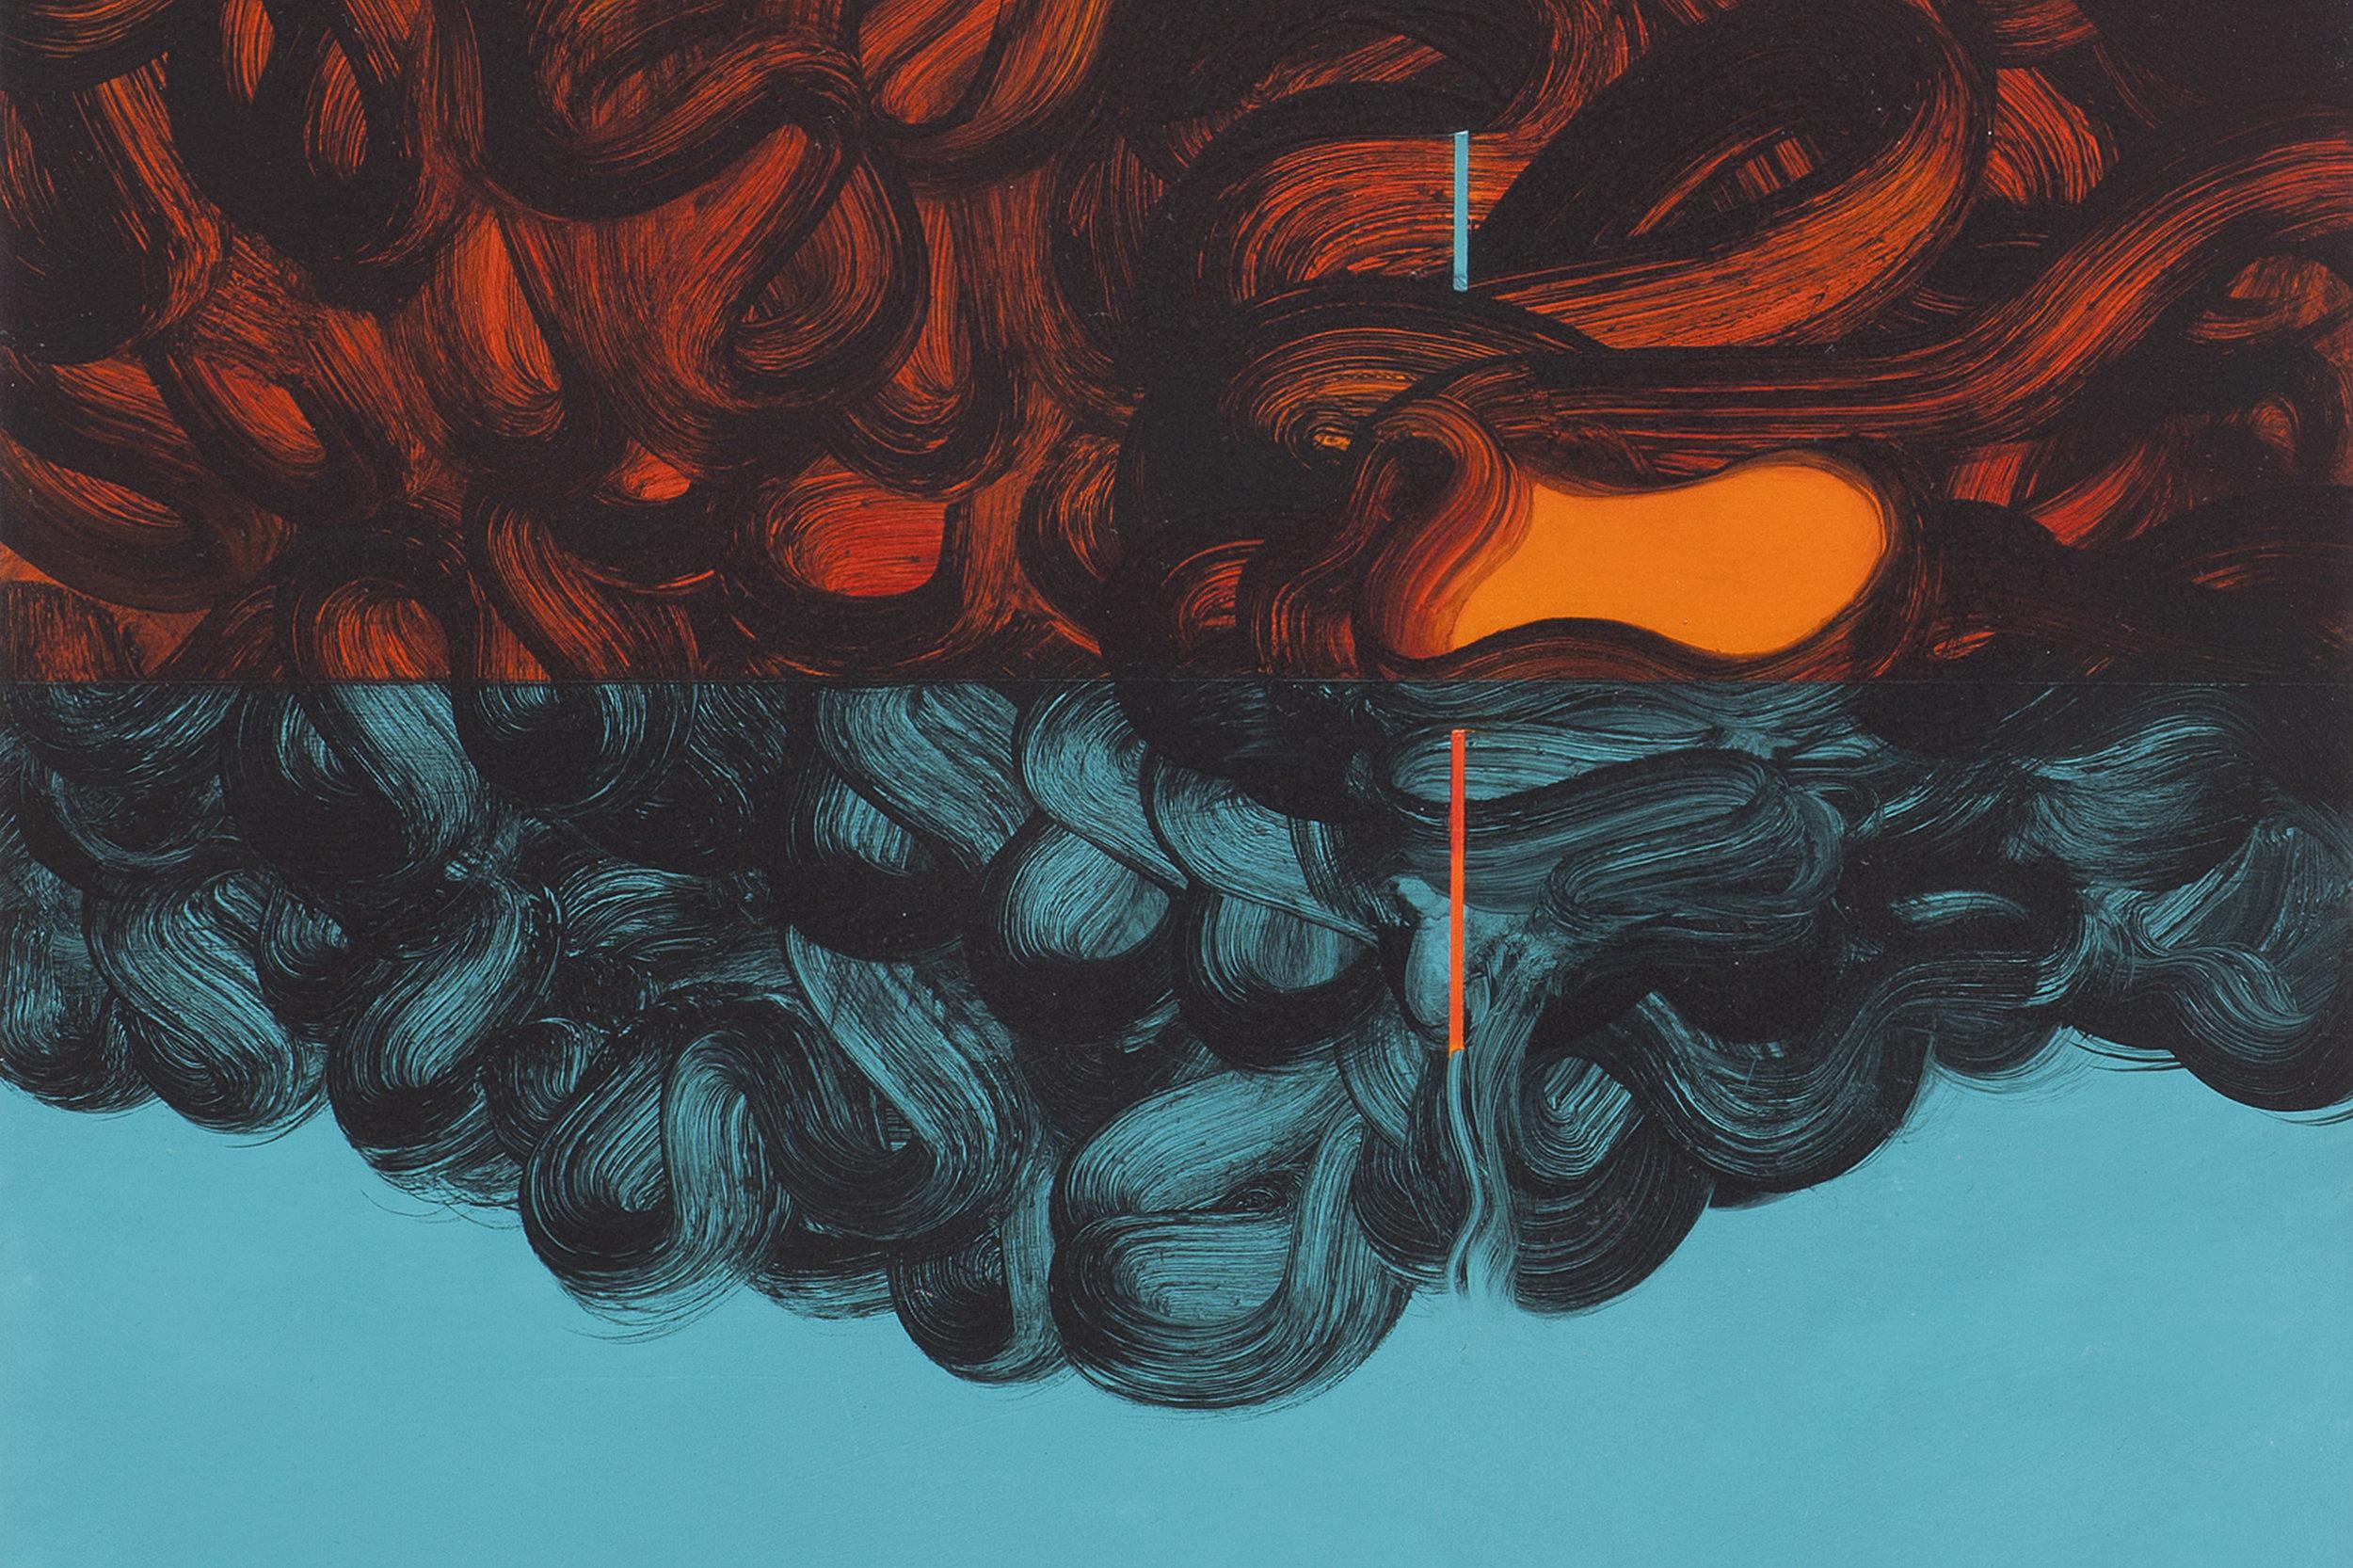 Reverse Transcription, Oil on aluminium, © Suzi Morris